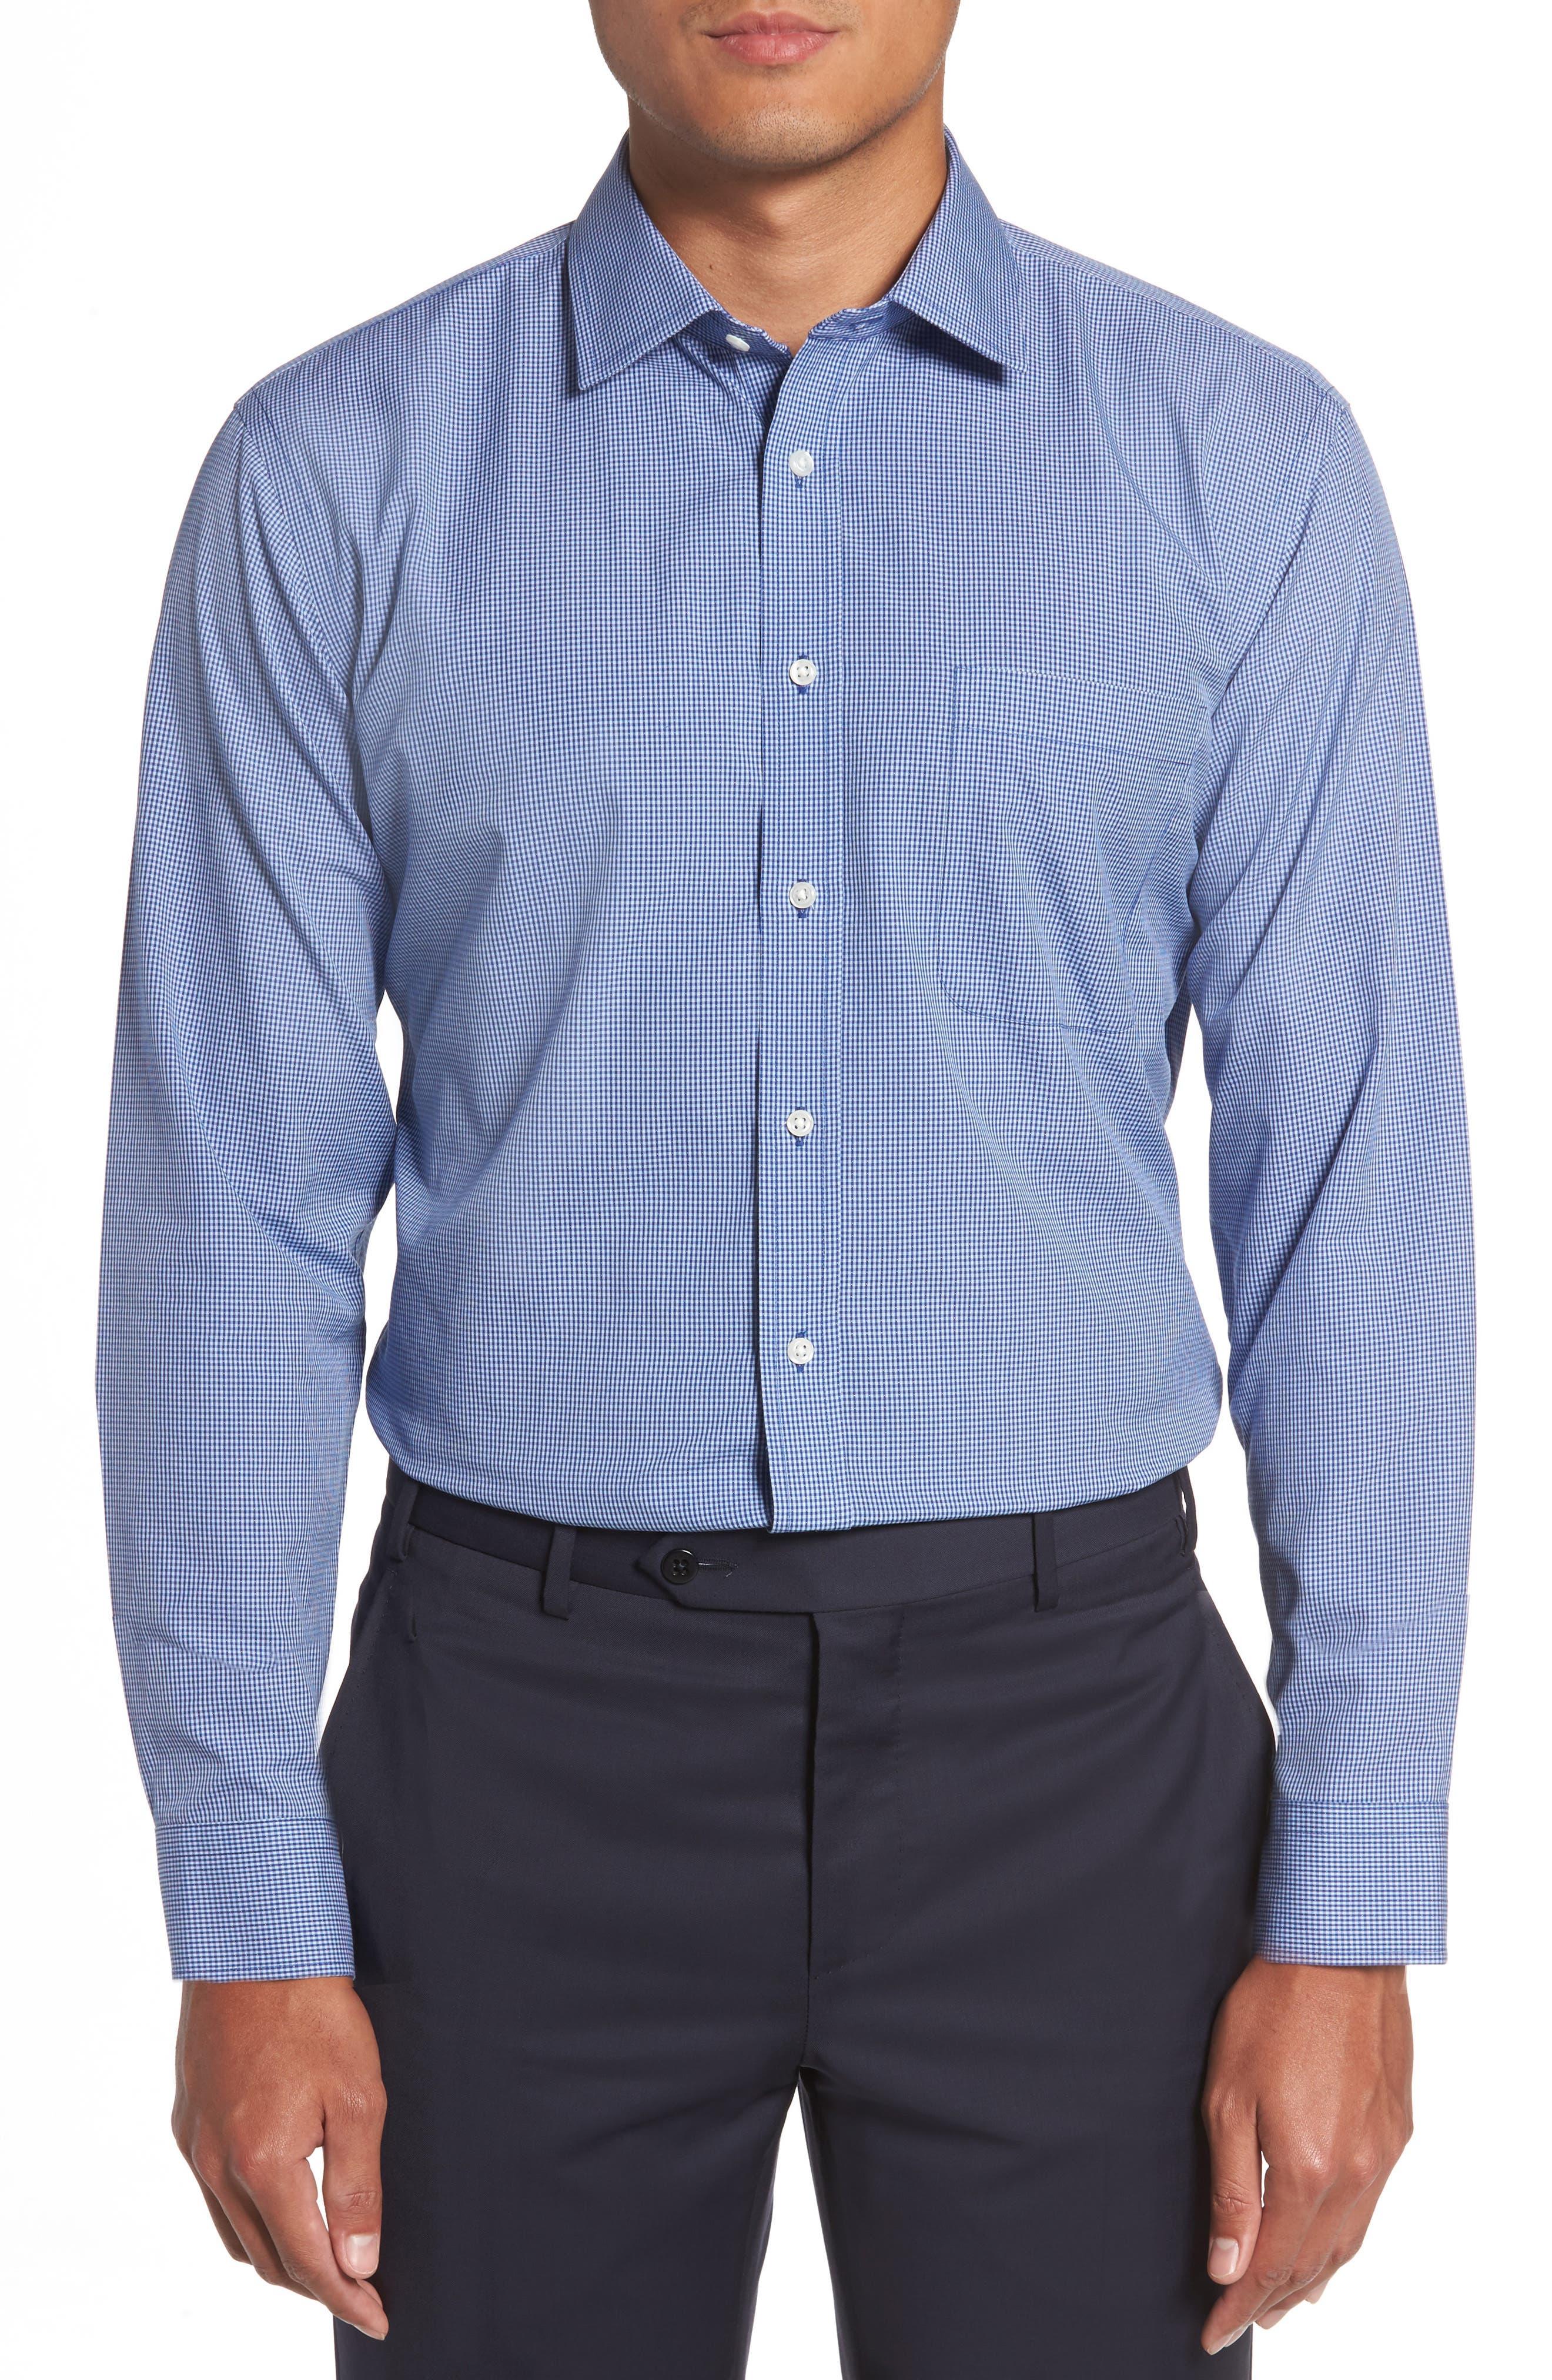 Smartcare<sup>™</sup> Trim Fit Check Dress Shirt,                         Main,                         color, Blue Nautical